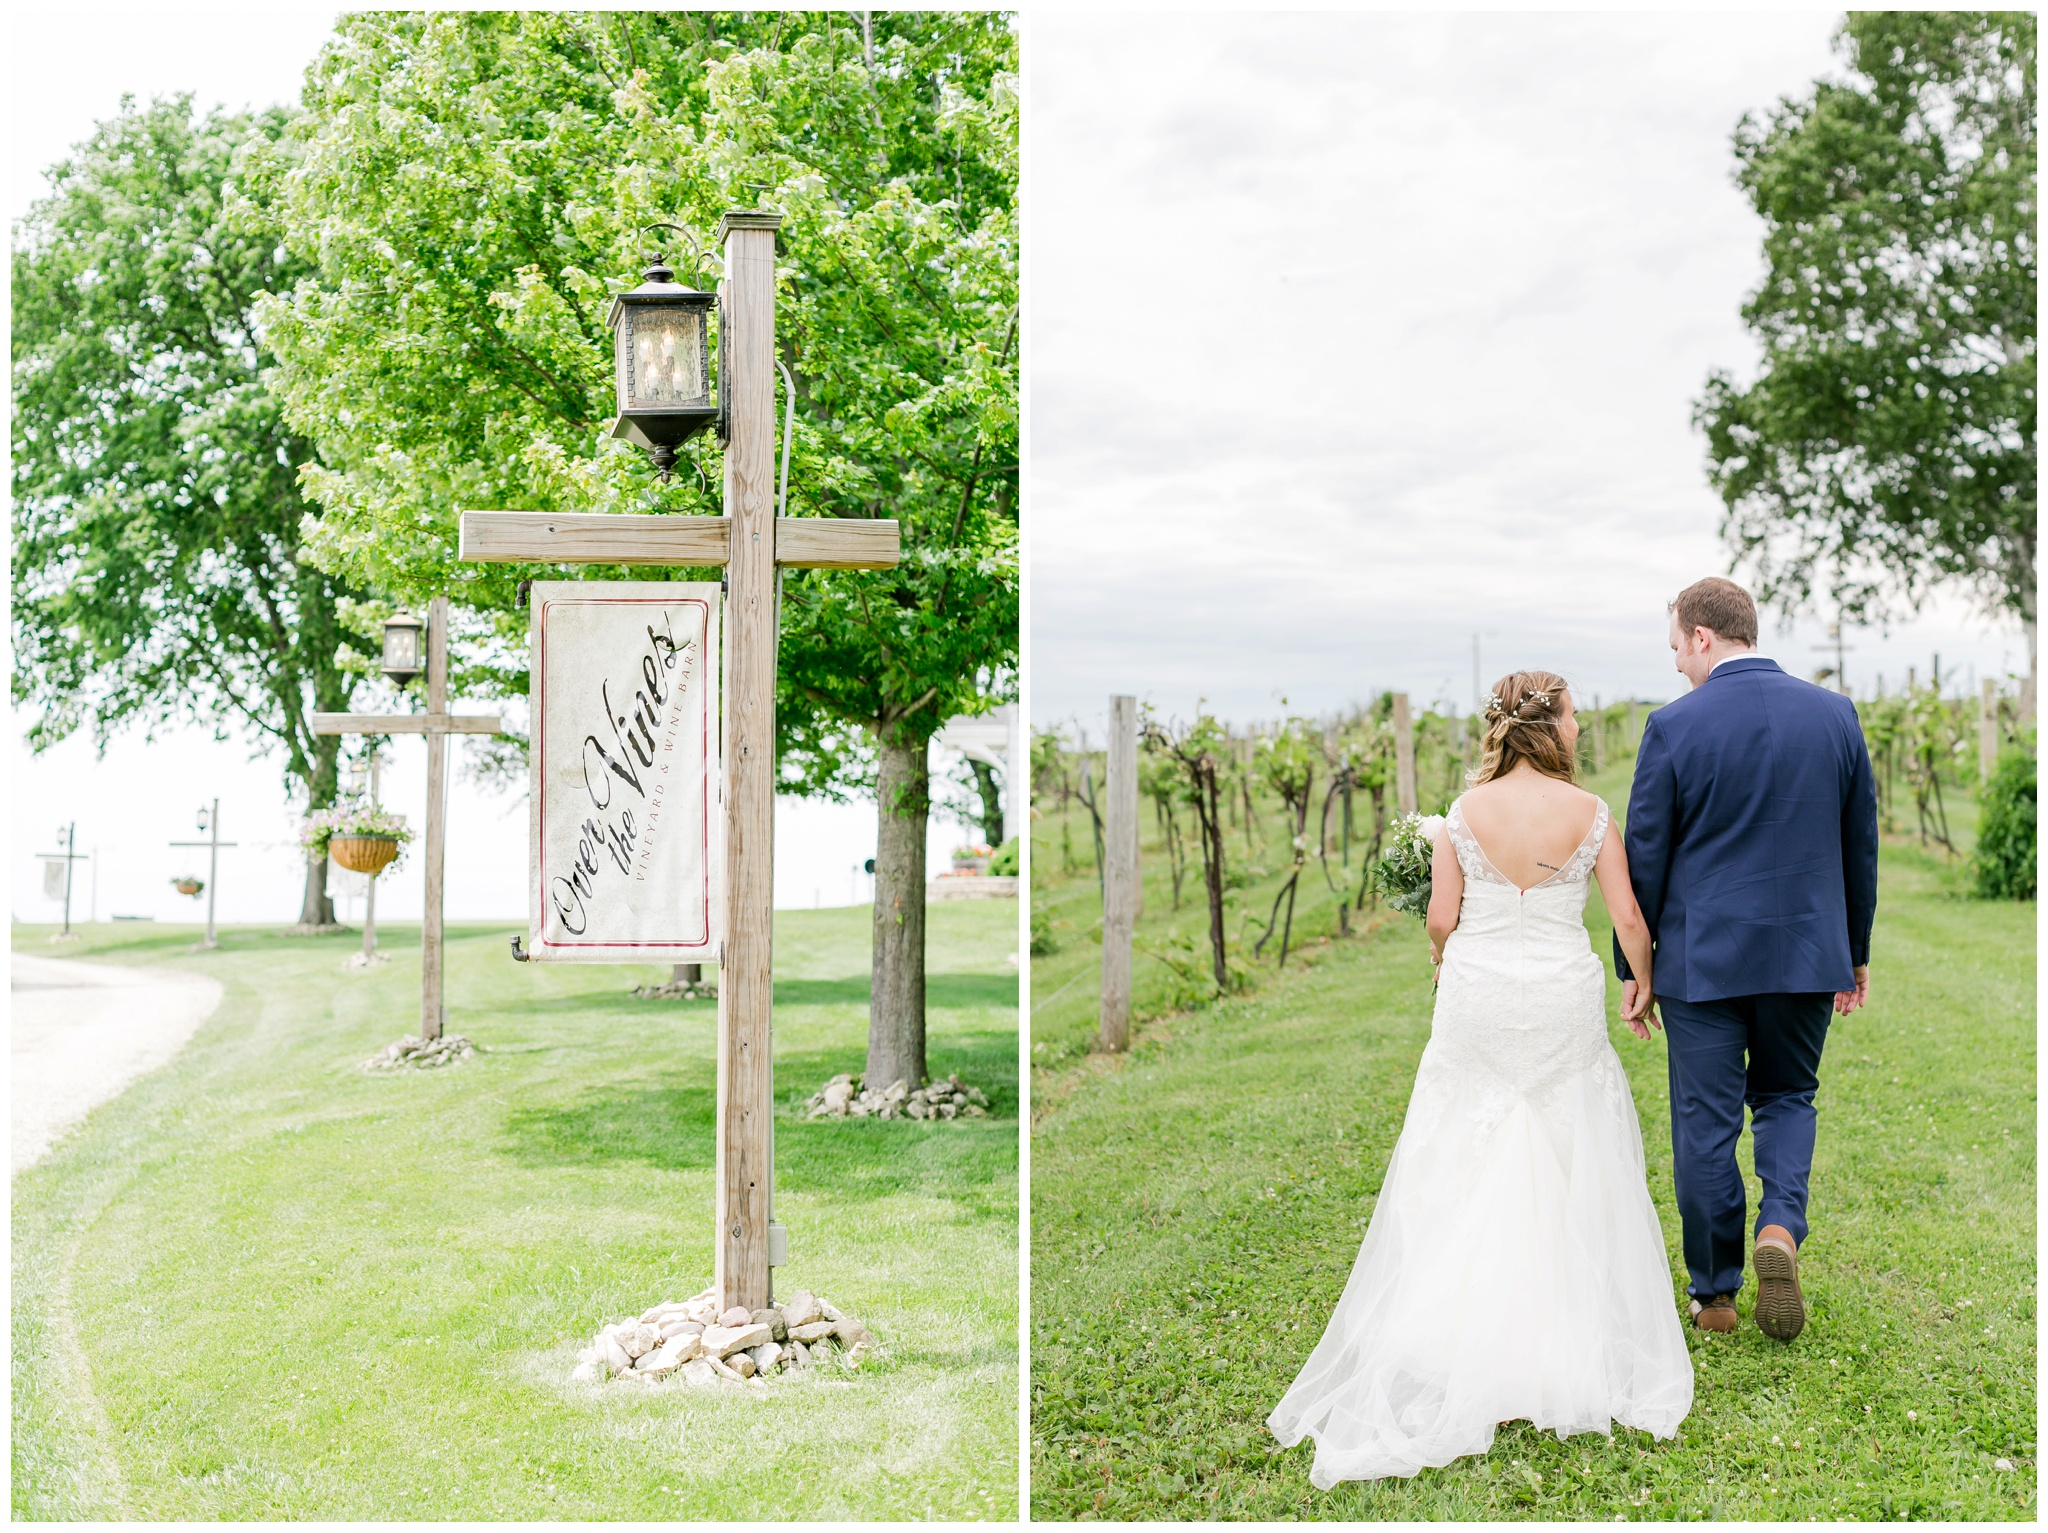 over_the_vines_wedding_edgerton_wisconsin_wedding_caynay_photo_4011.jpg